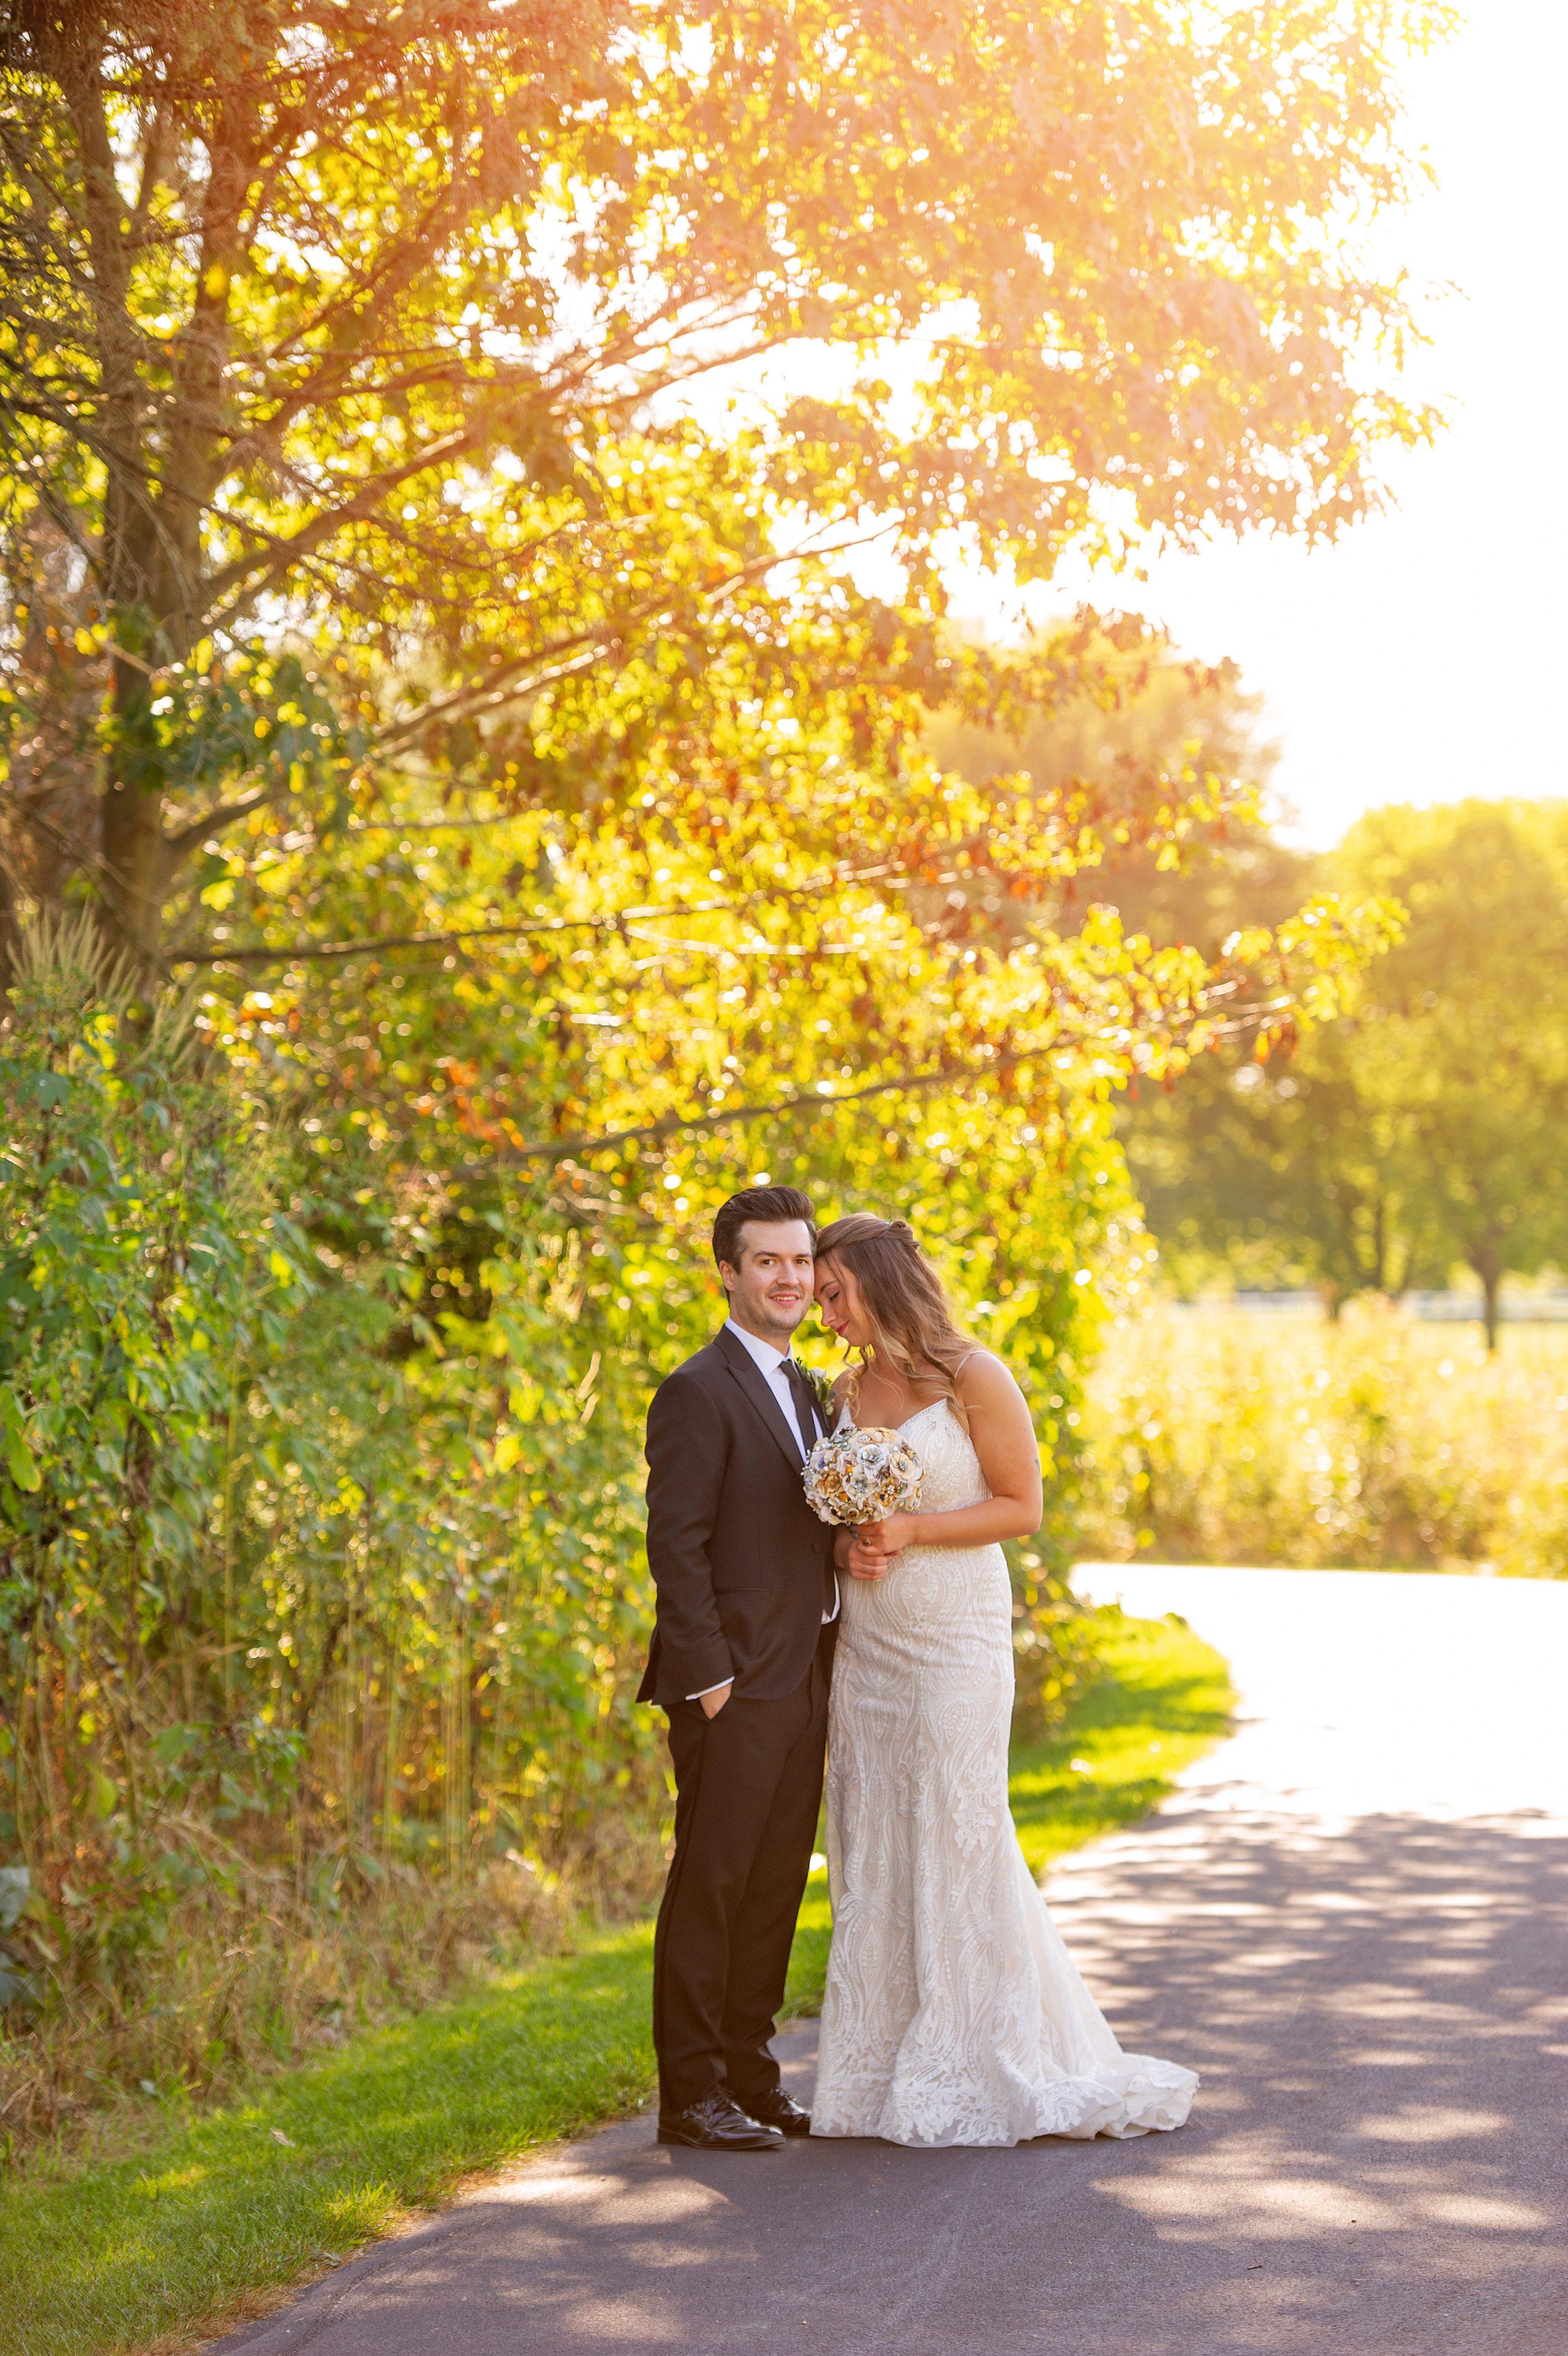 Wheaton Wedding Photographer, Laura Meyer